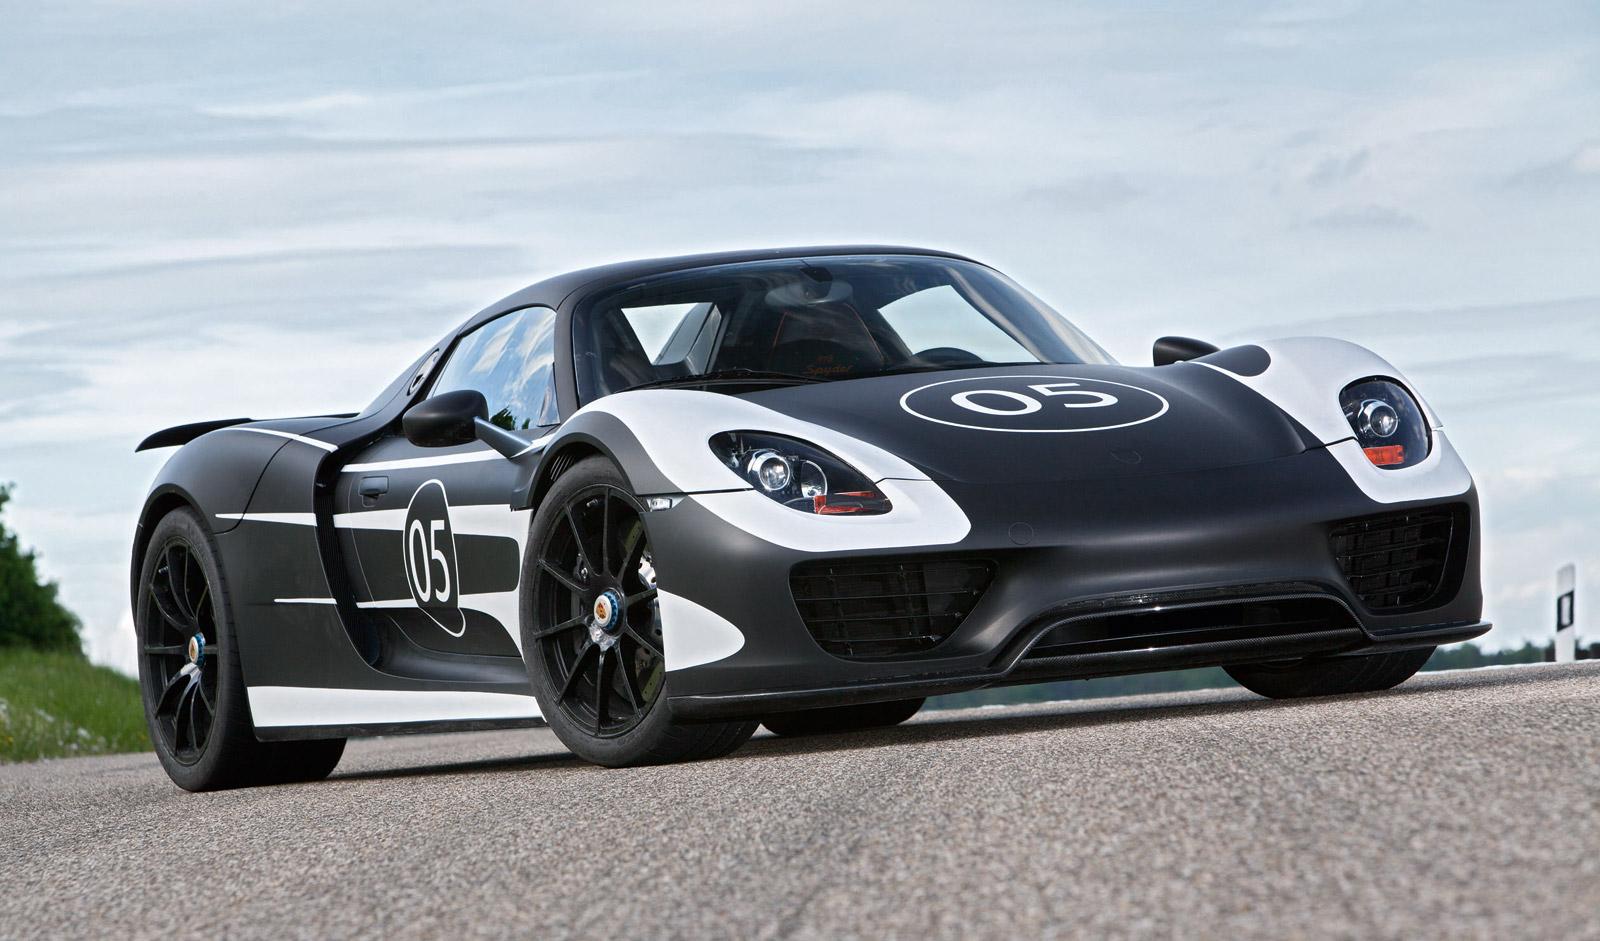 Porsche 918 Spyder To Get Optional Race Track Package Report